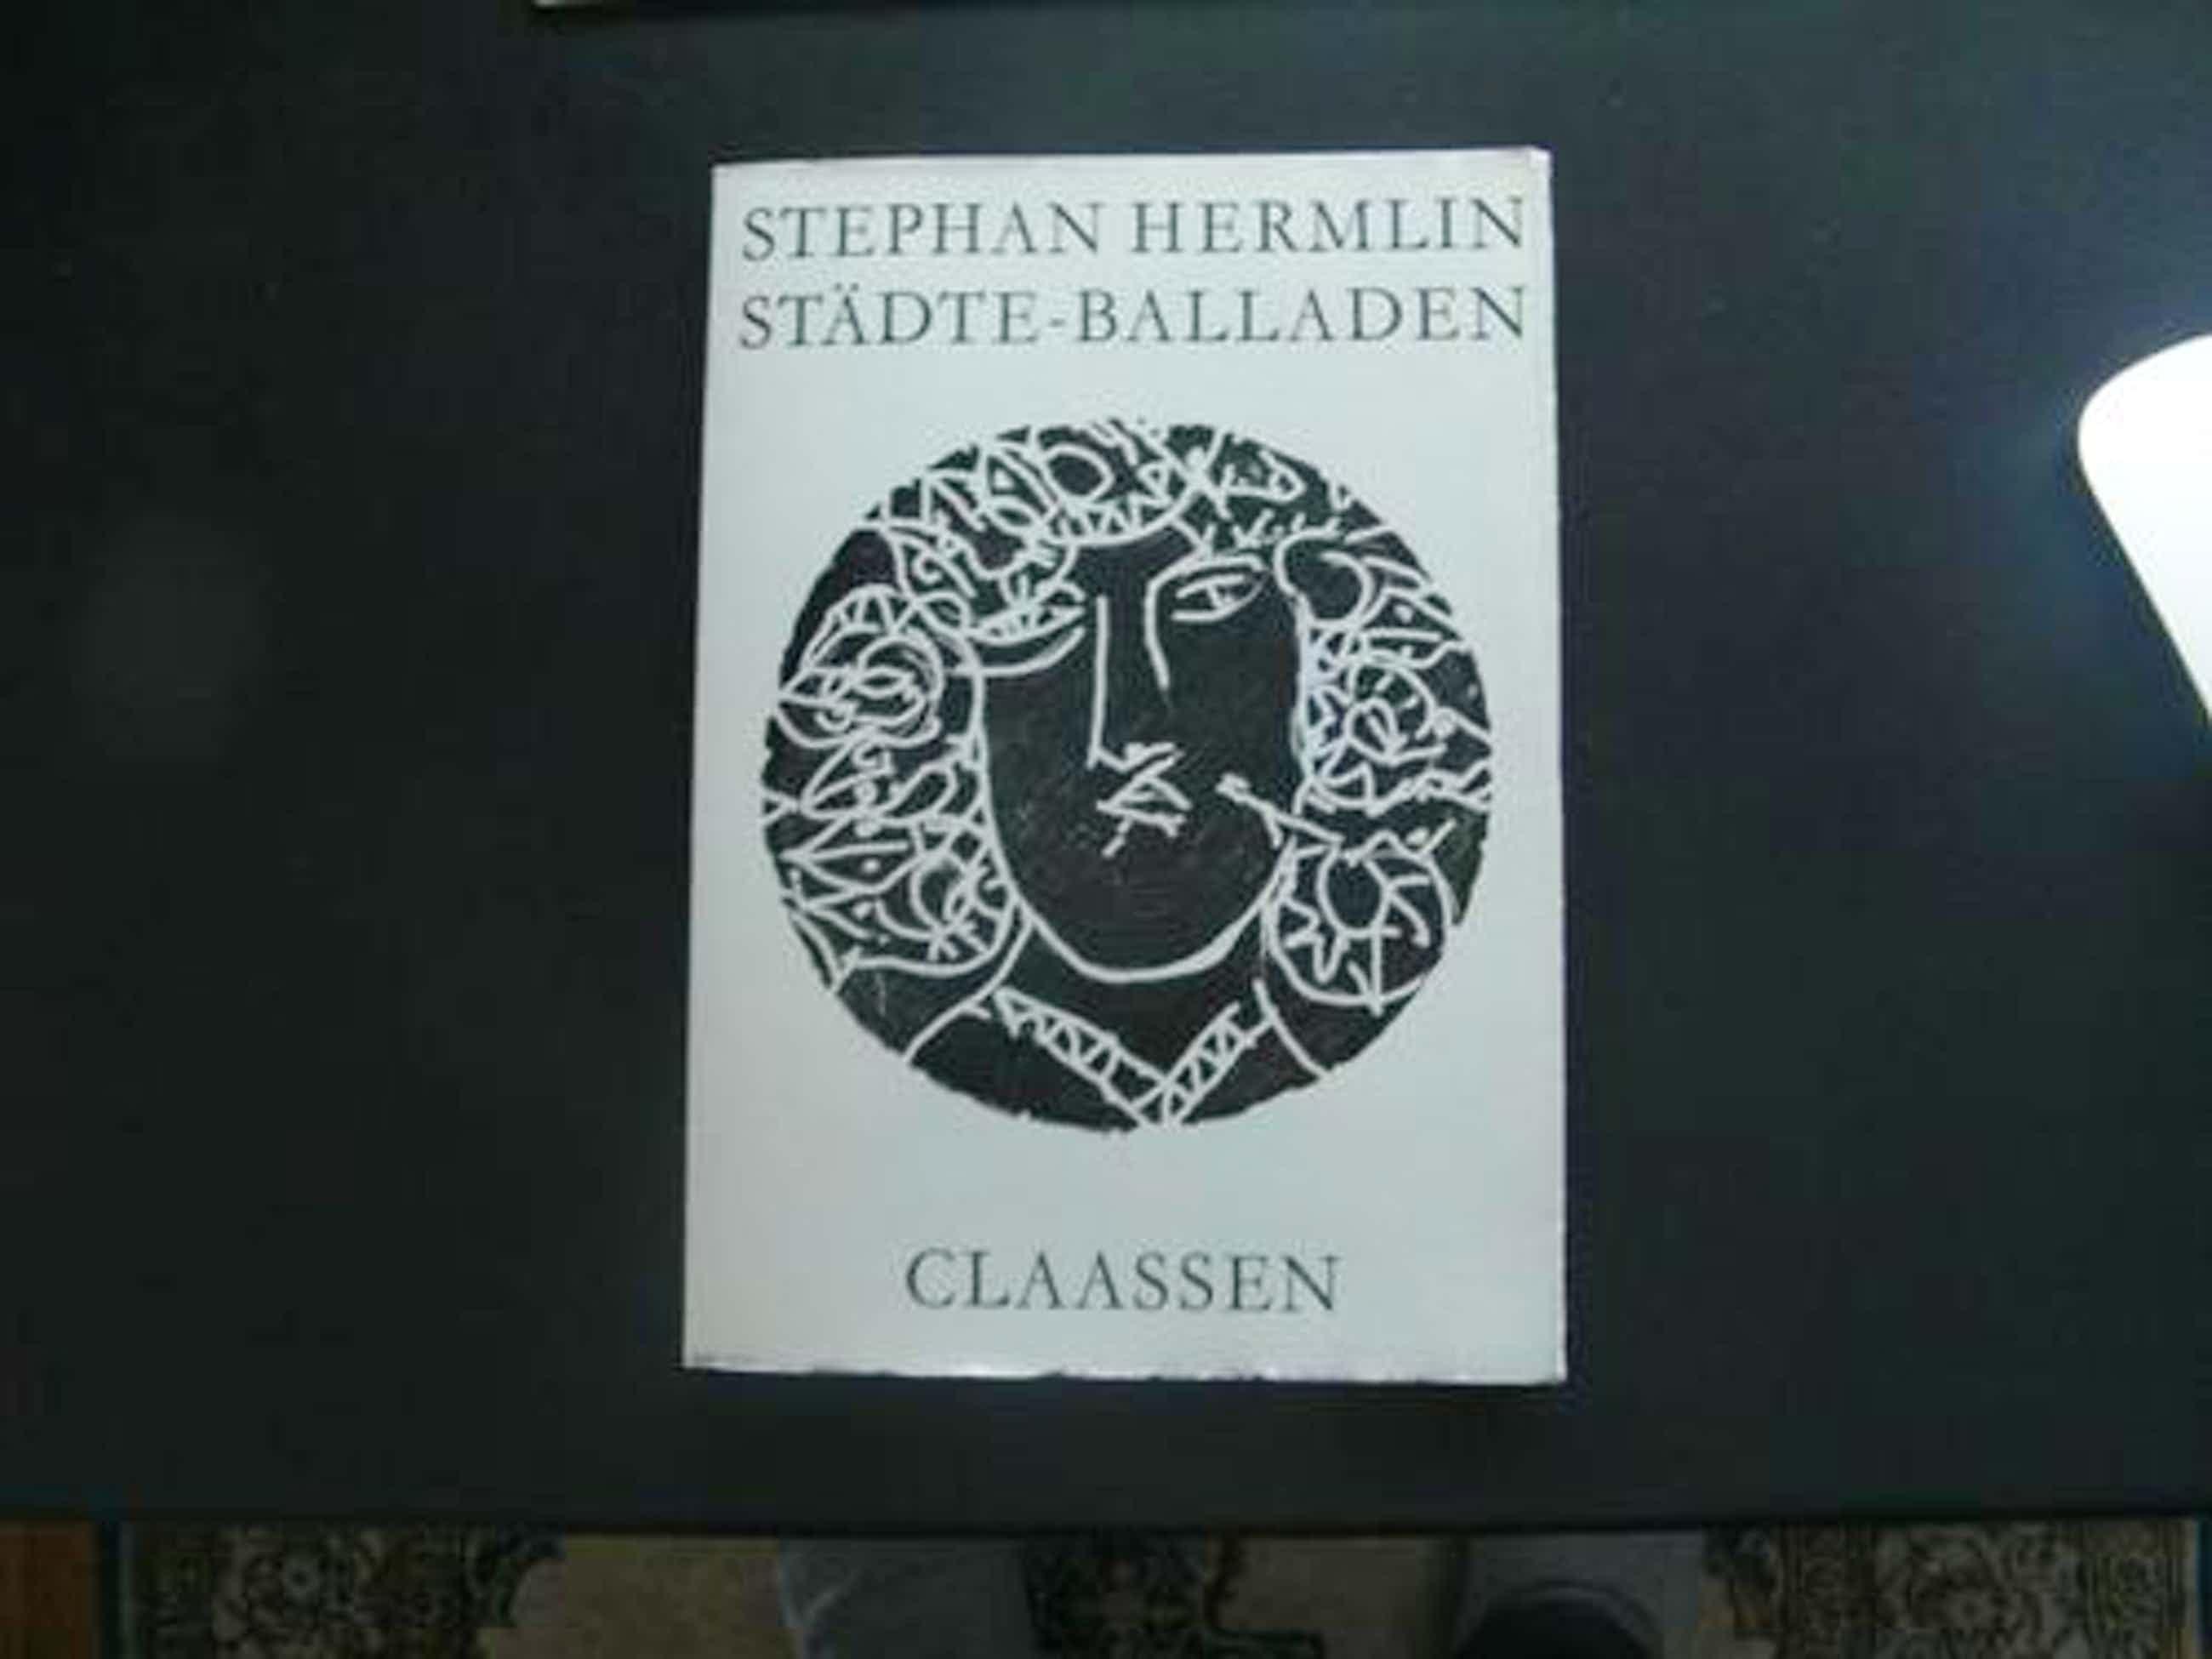 Helmut Andreas Paul GRIESHABER Grieshaber - STÄDTE - BALLADEN STEHPHAN HERMLIN kopen? Bied vanaf 28!